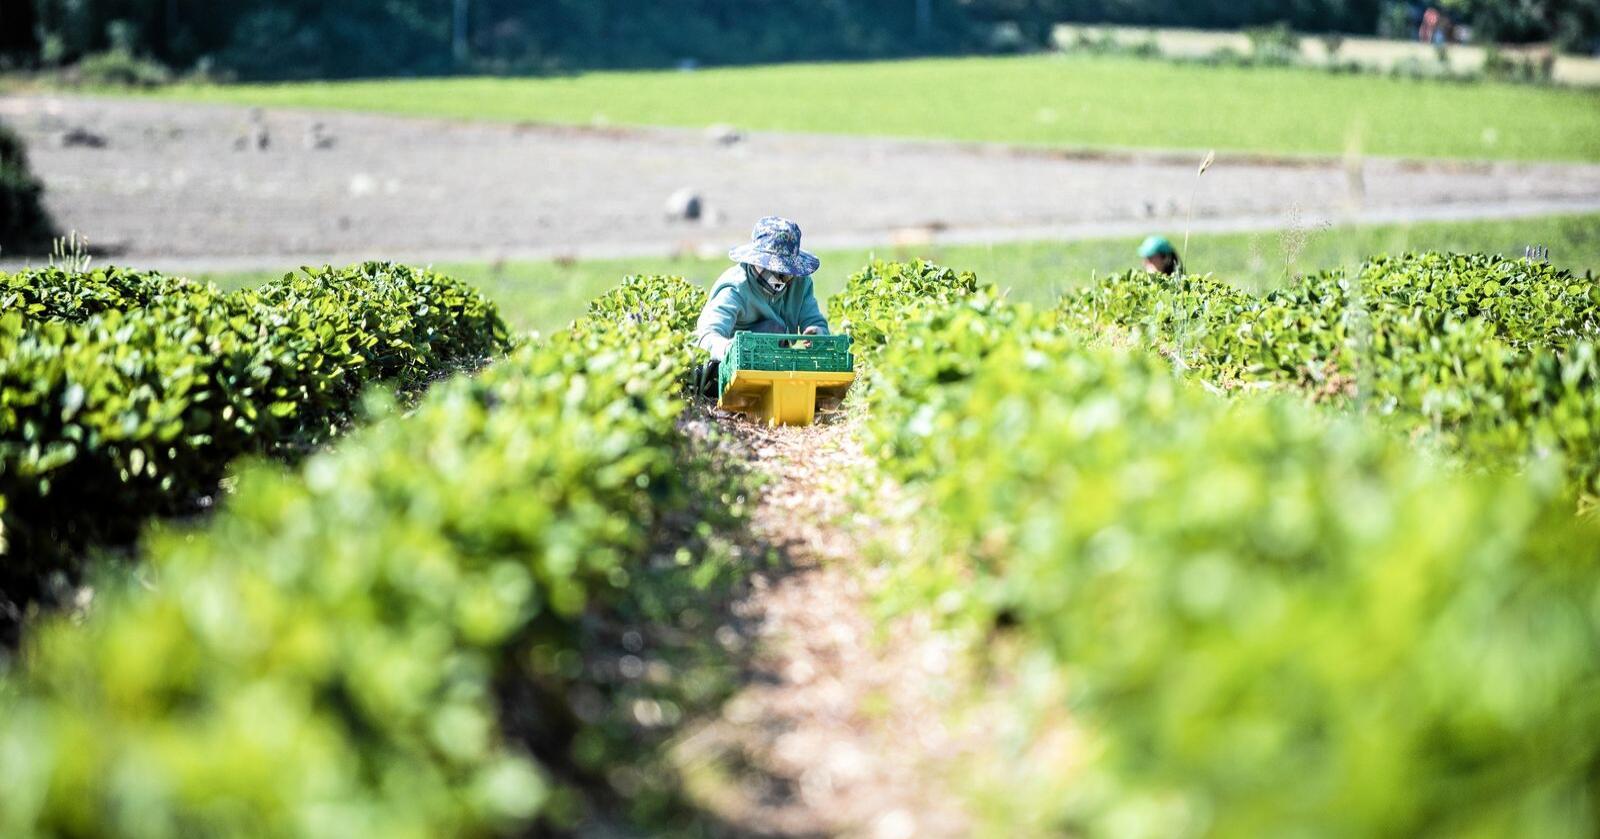 Mangel på sesongarbeidskraft er et problem mange steder i Europa denne landbrukssesongen. Foto: Vidar Sandnes